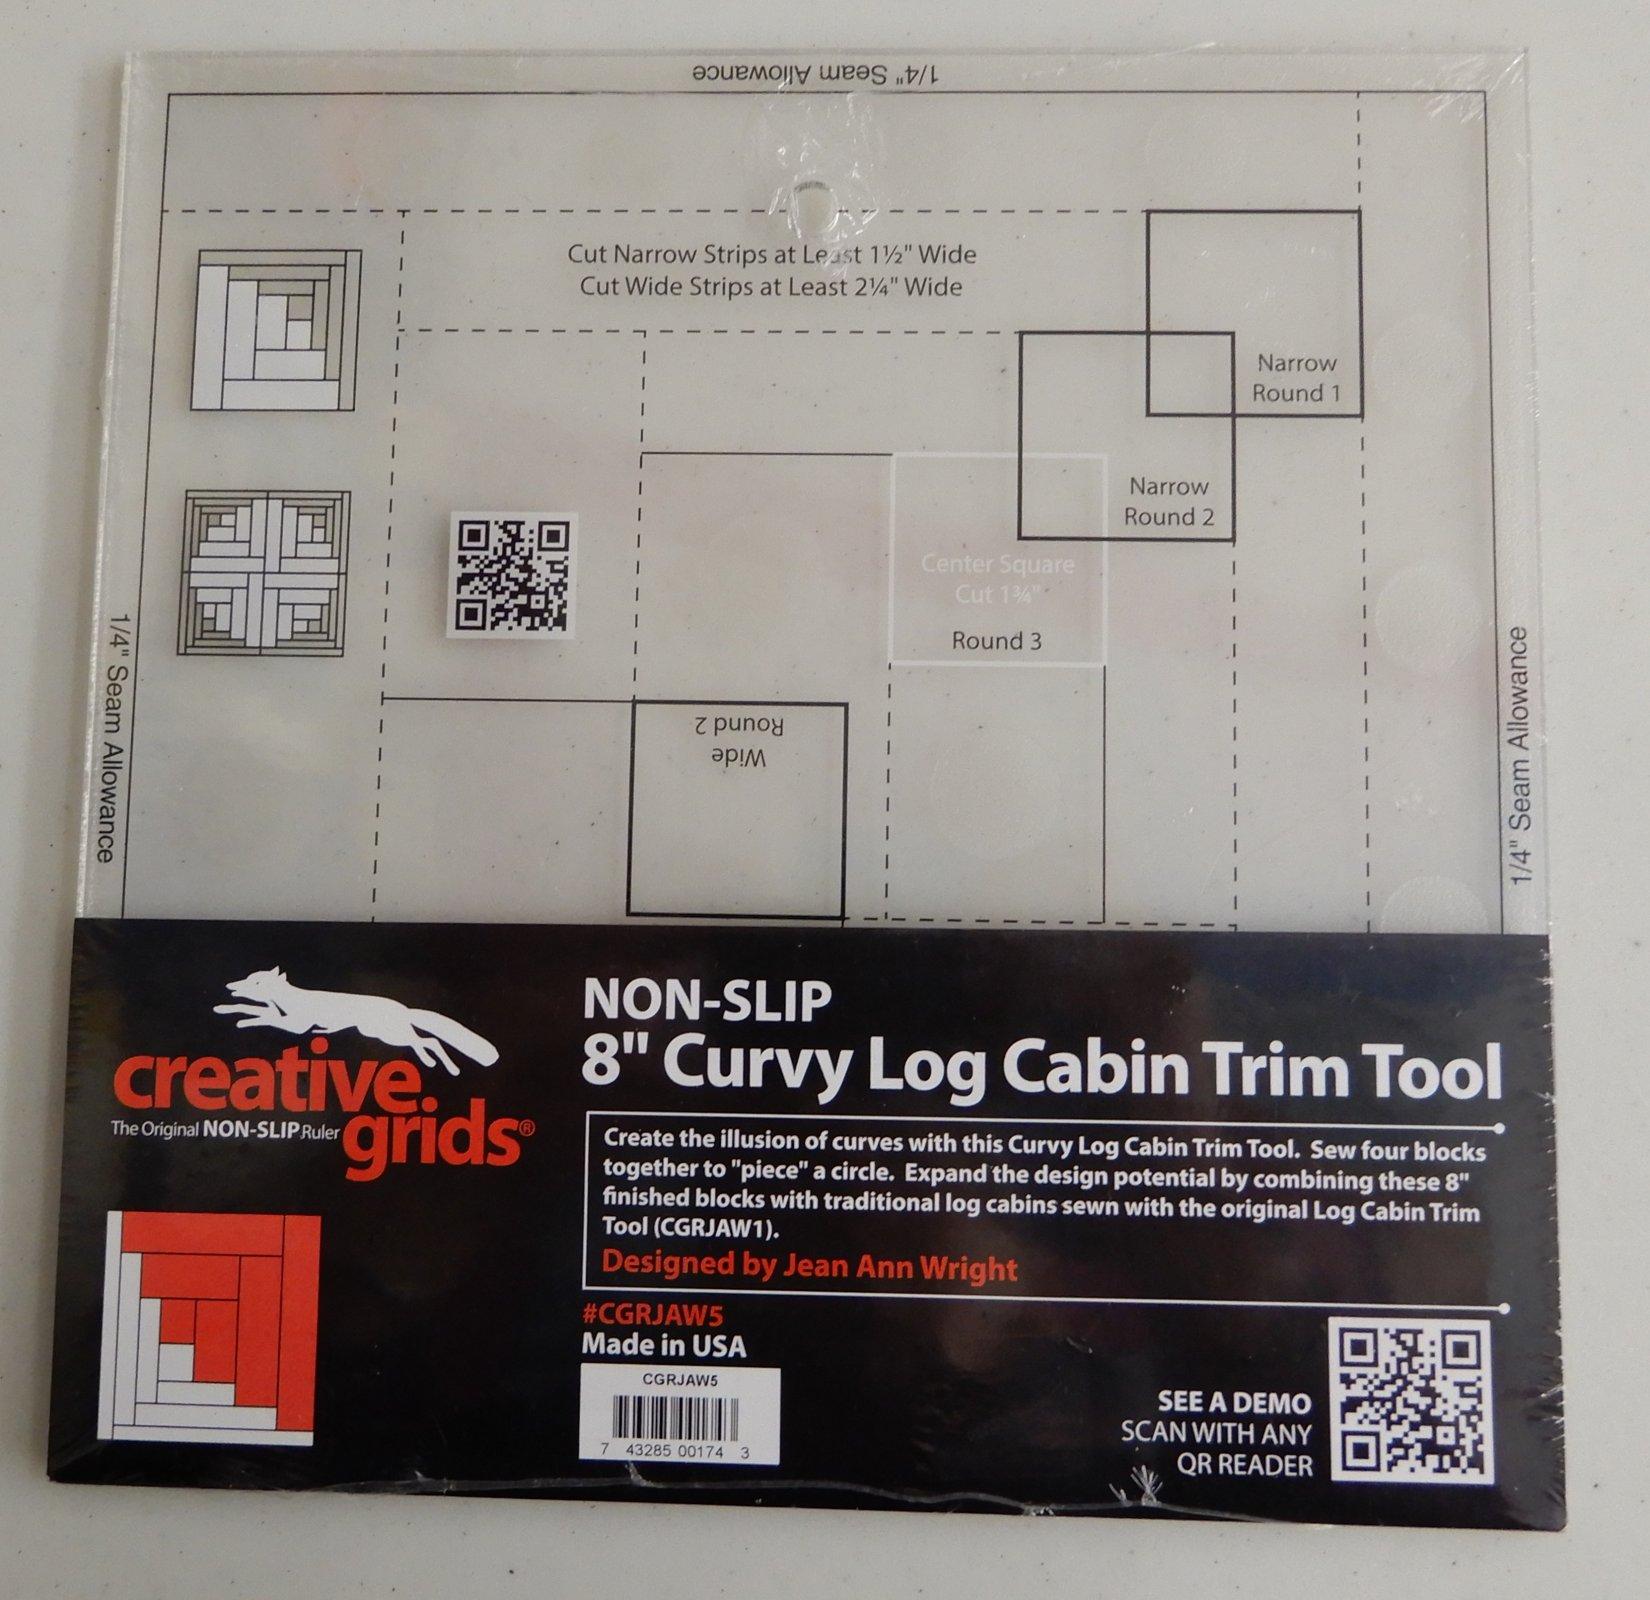 Creative Grids 8 Curvy Log Cabin Trim Tool